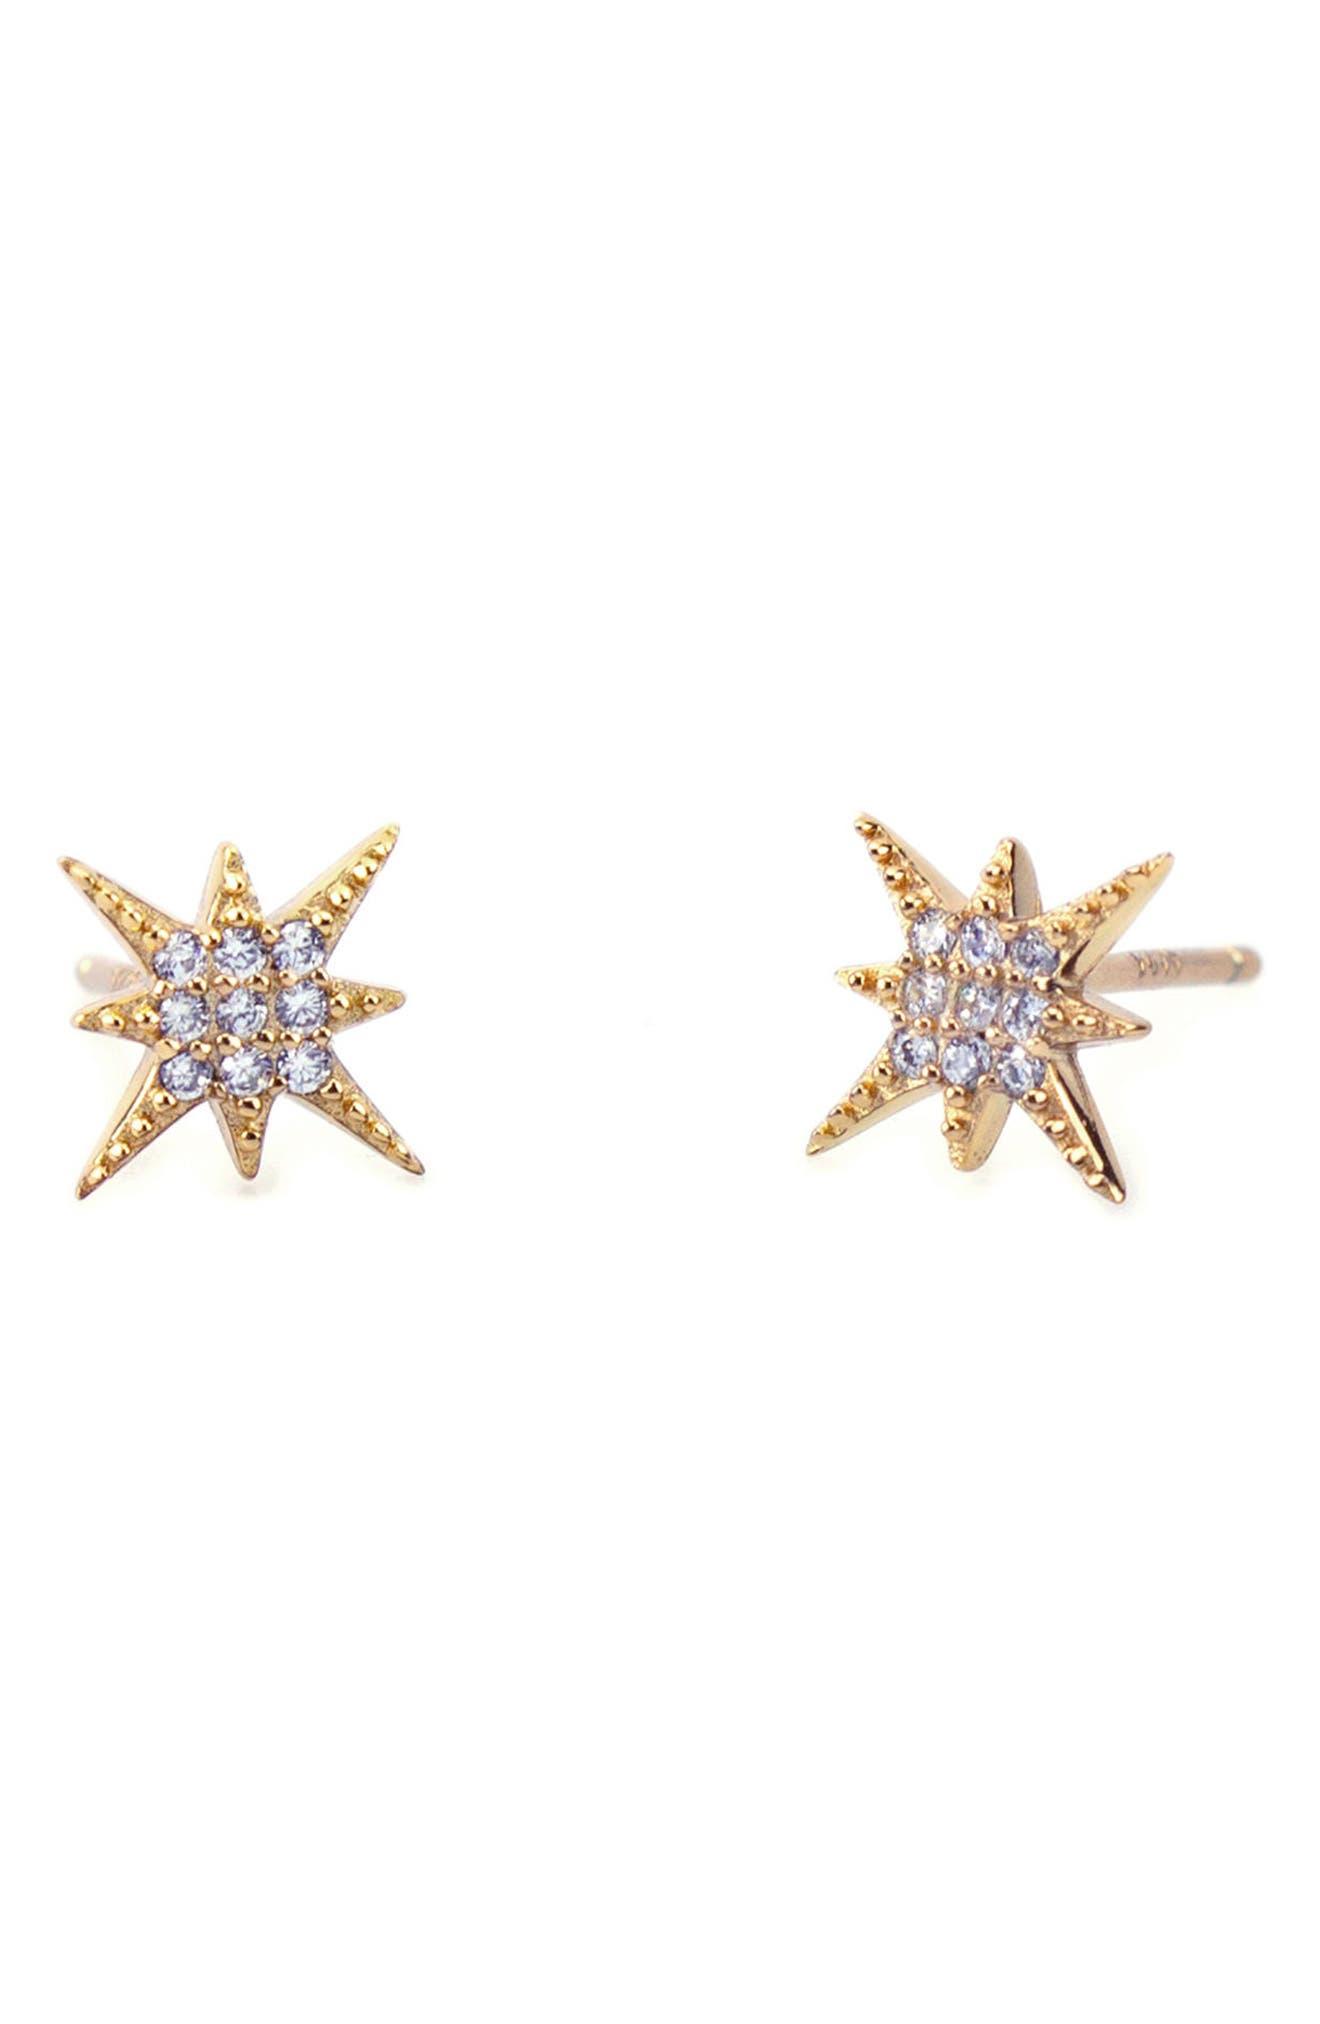 Main Image - Kris Nations Pavé Starburst Stud Earrings